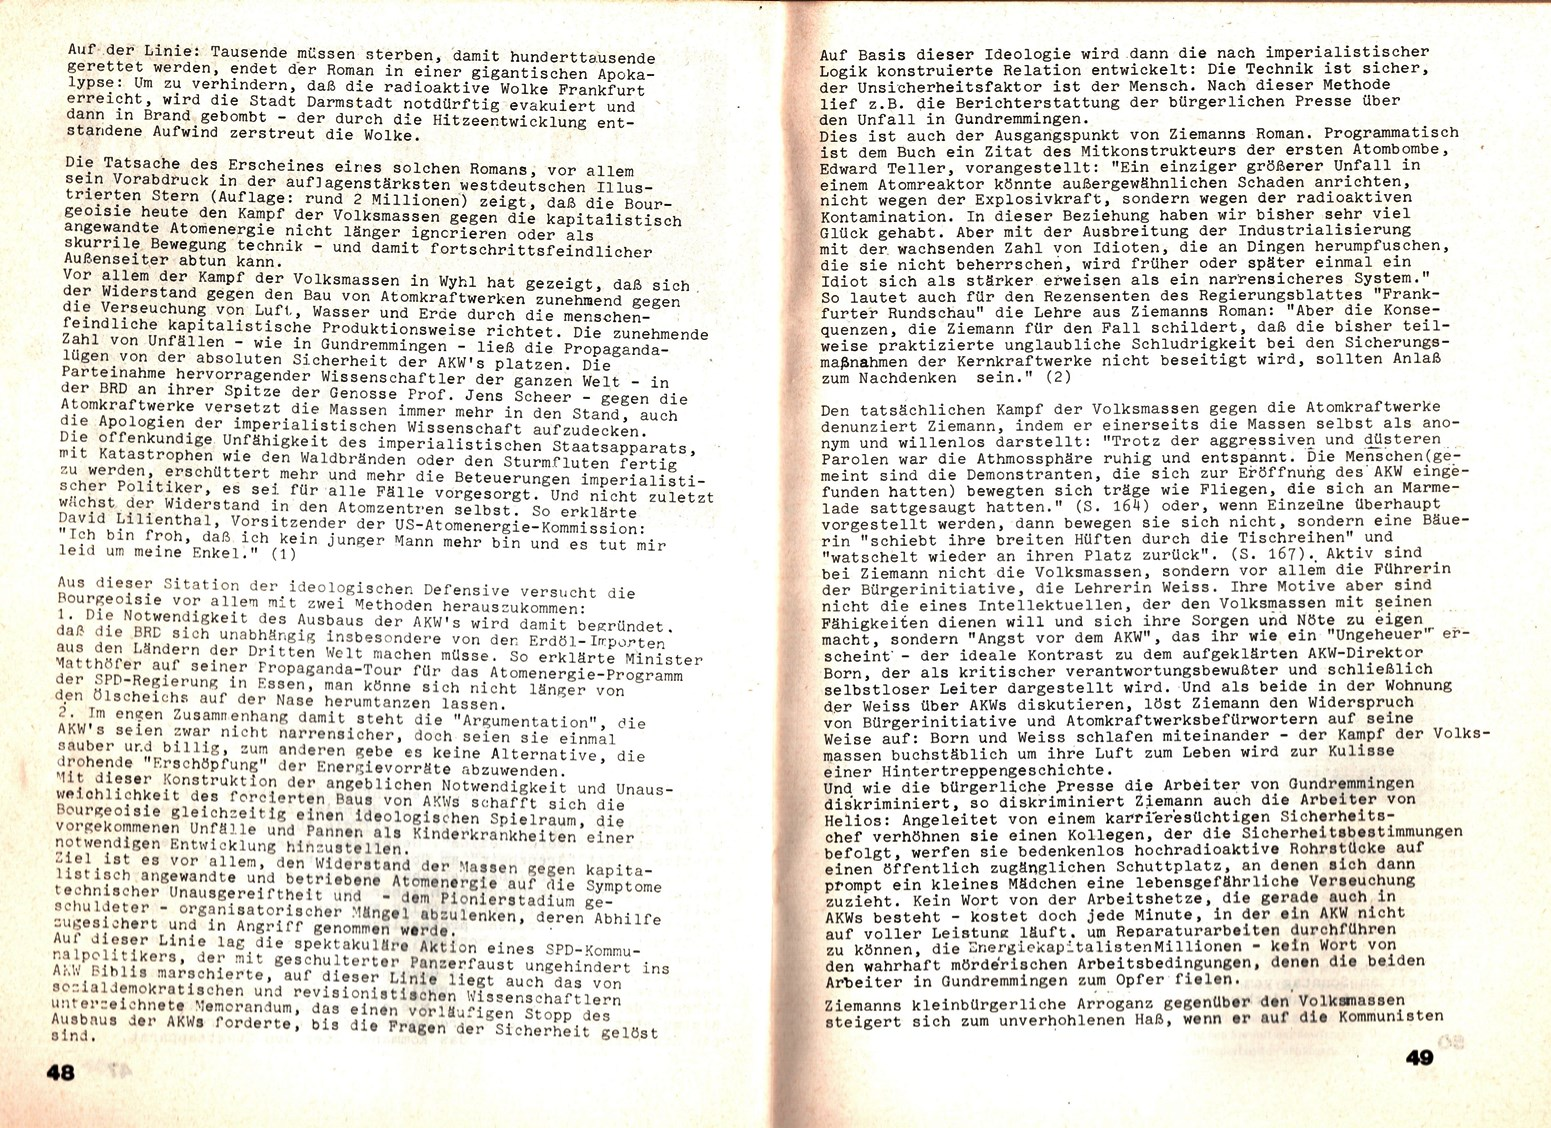 KSV_1976_Atomenergie_im_Kapitalismus_026